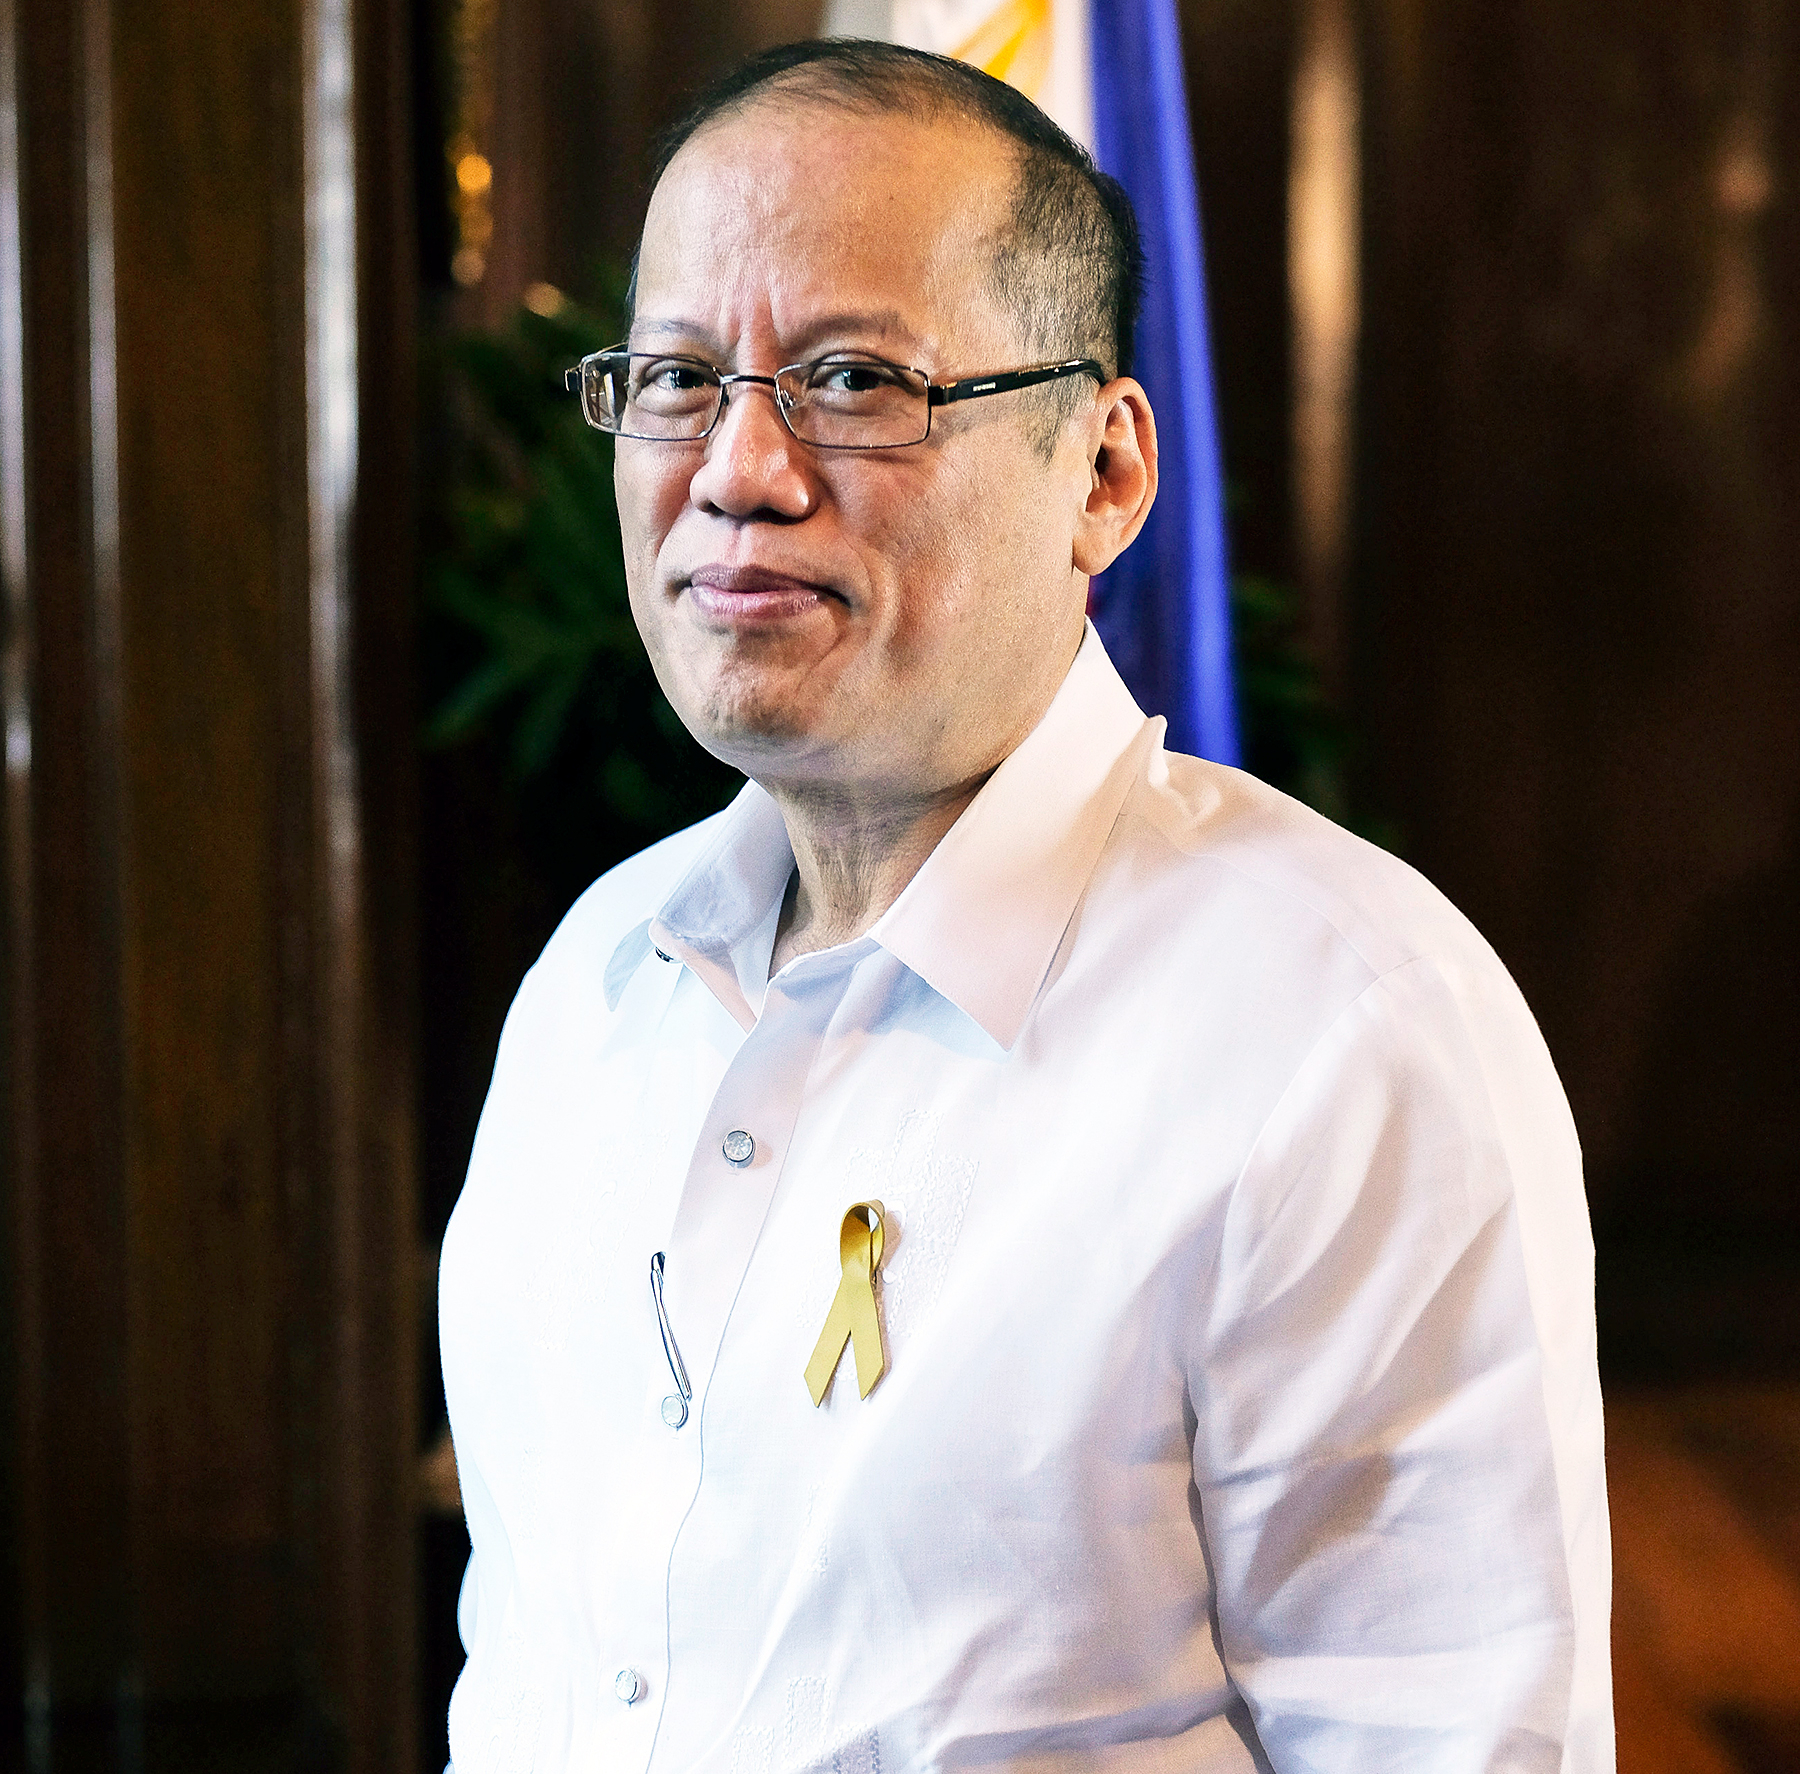 Philippine President Benigno Aquino III